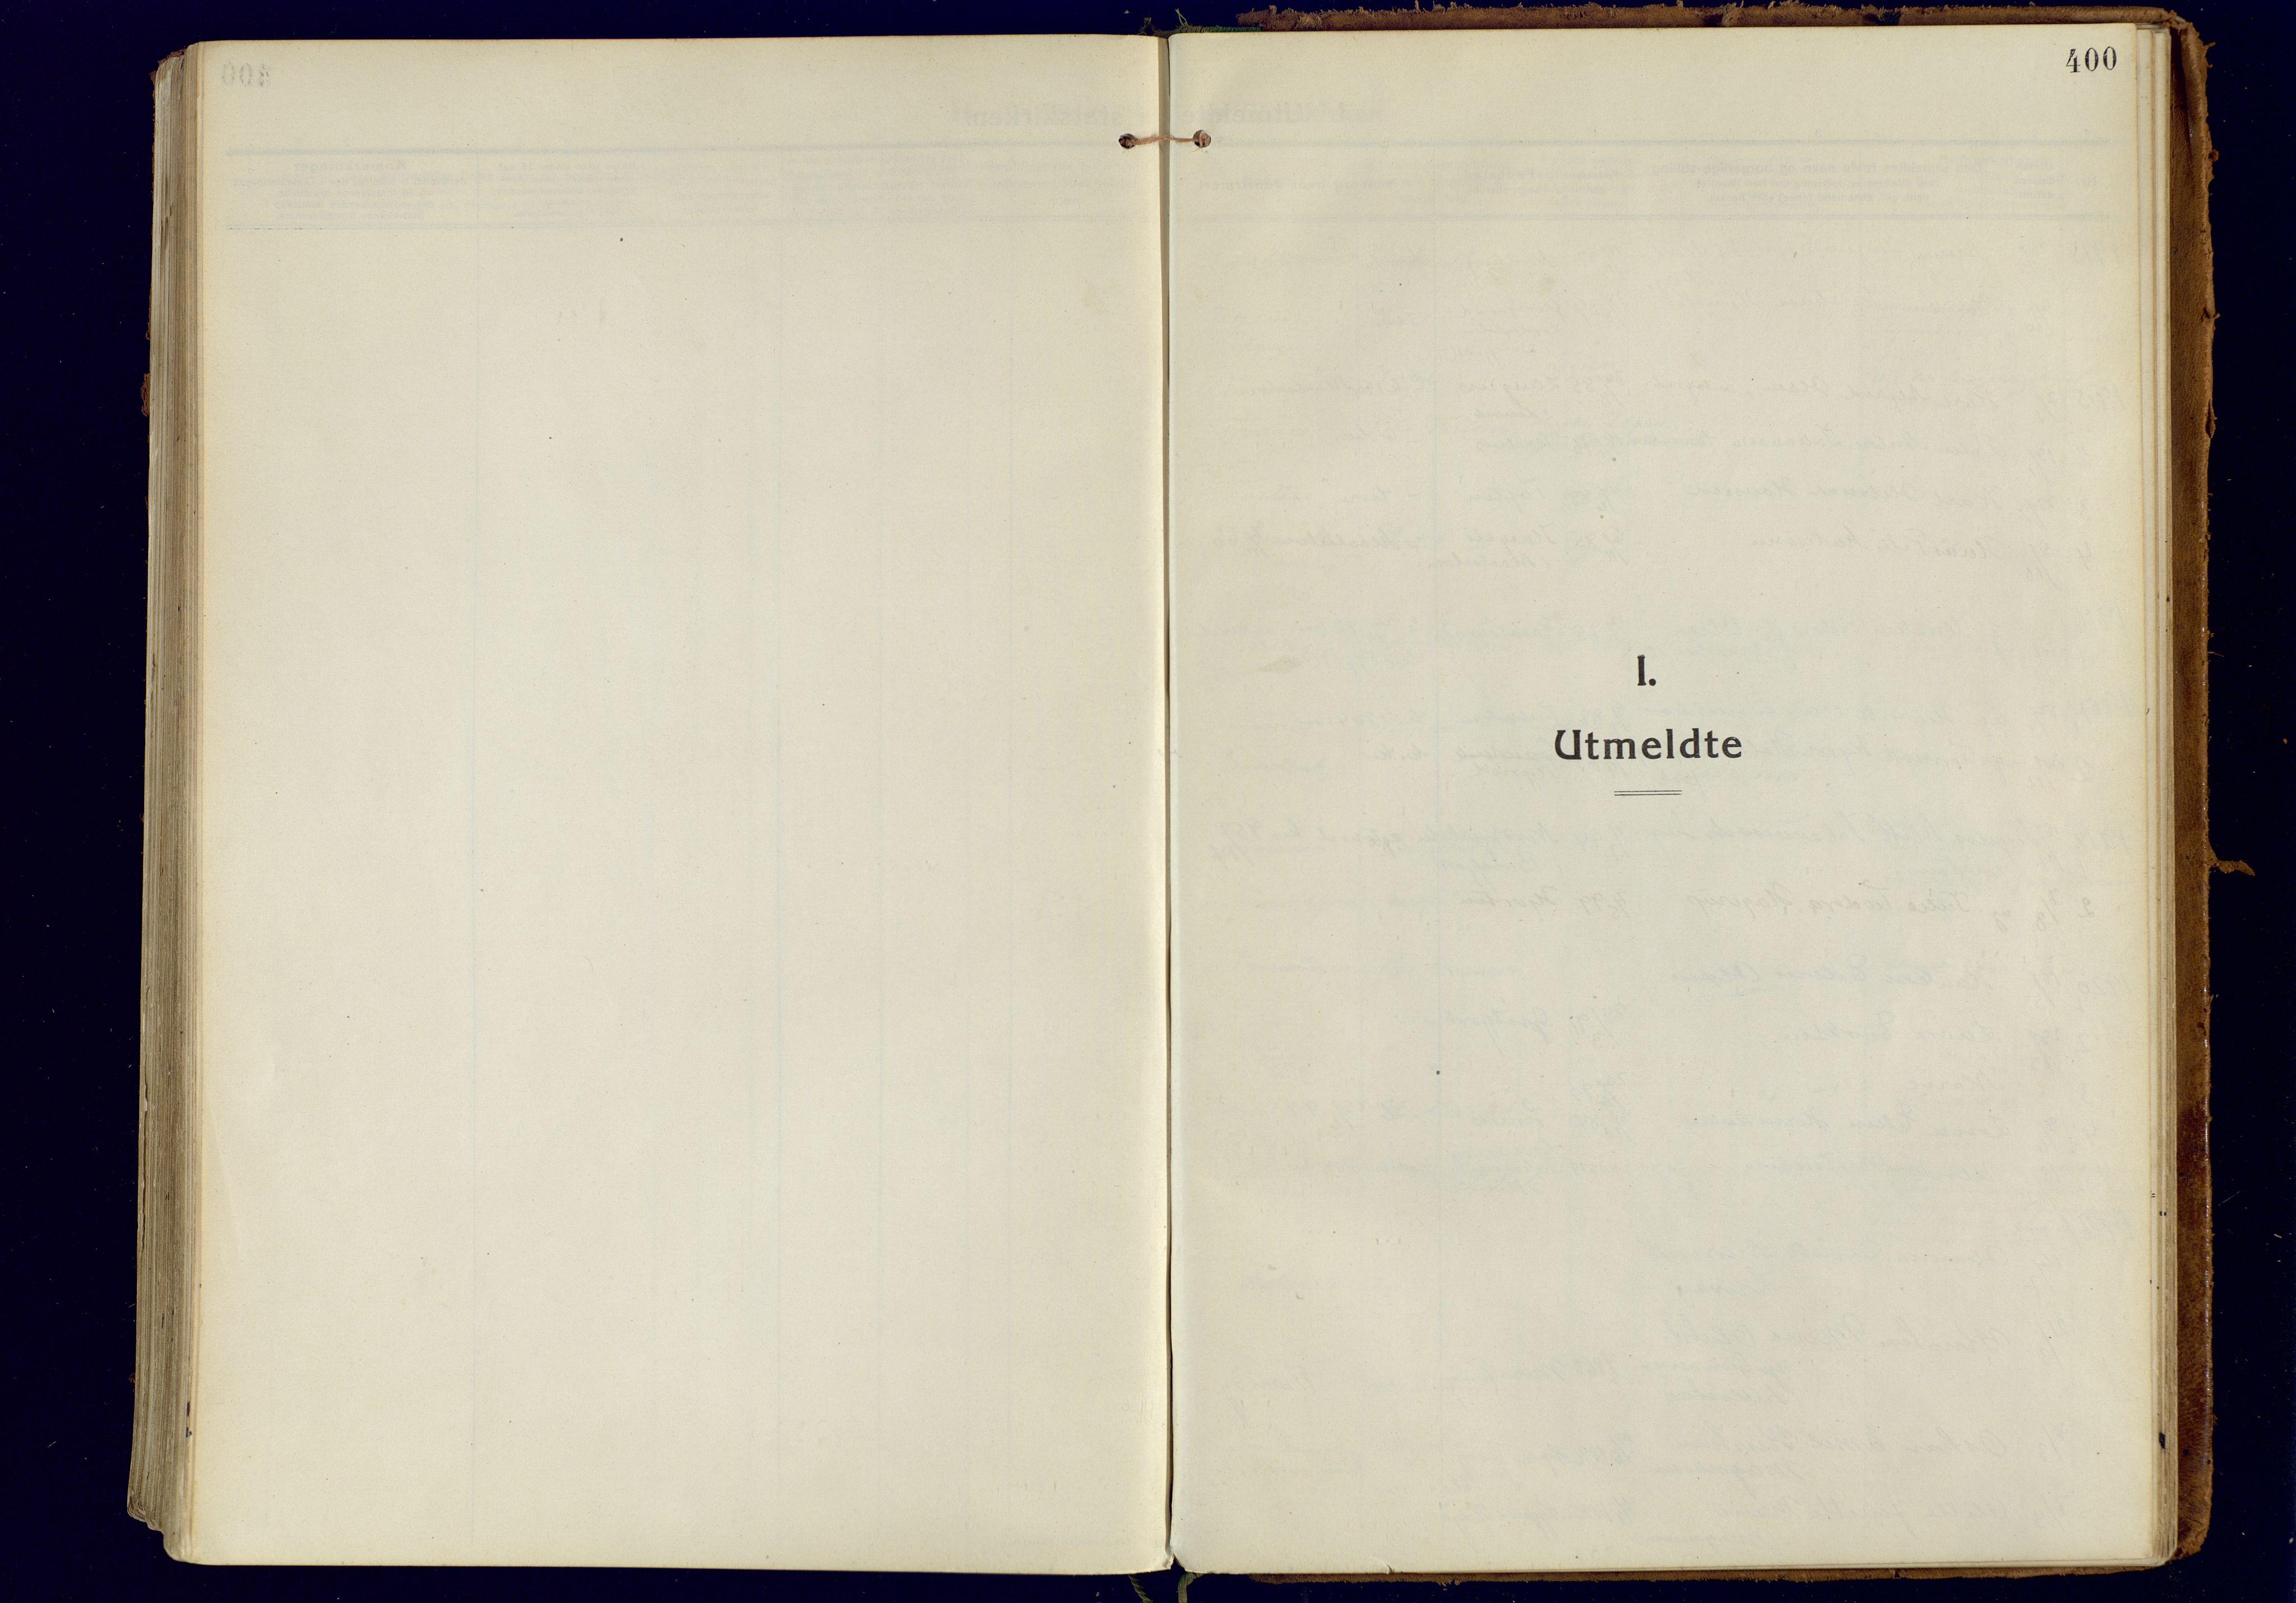 SATØ, Tromsøysund sokneprestkontor, G/Ga: Ministerialbok nr. 8, 1914-1922, s. 400